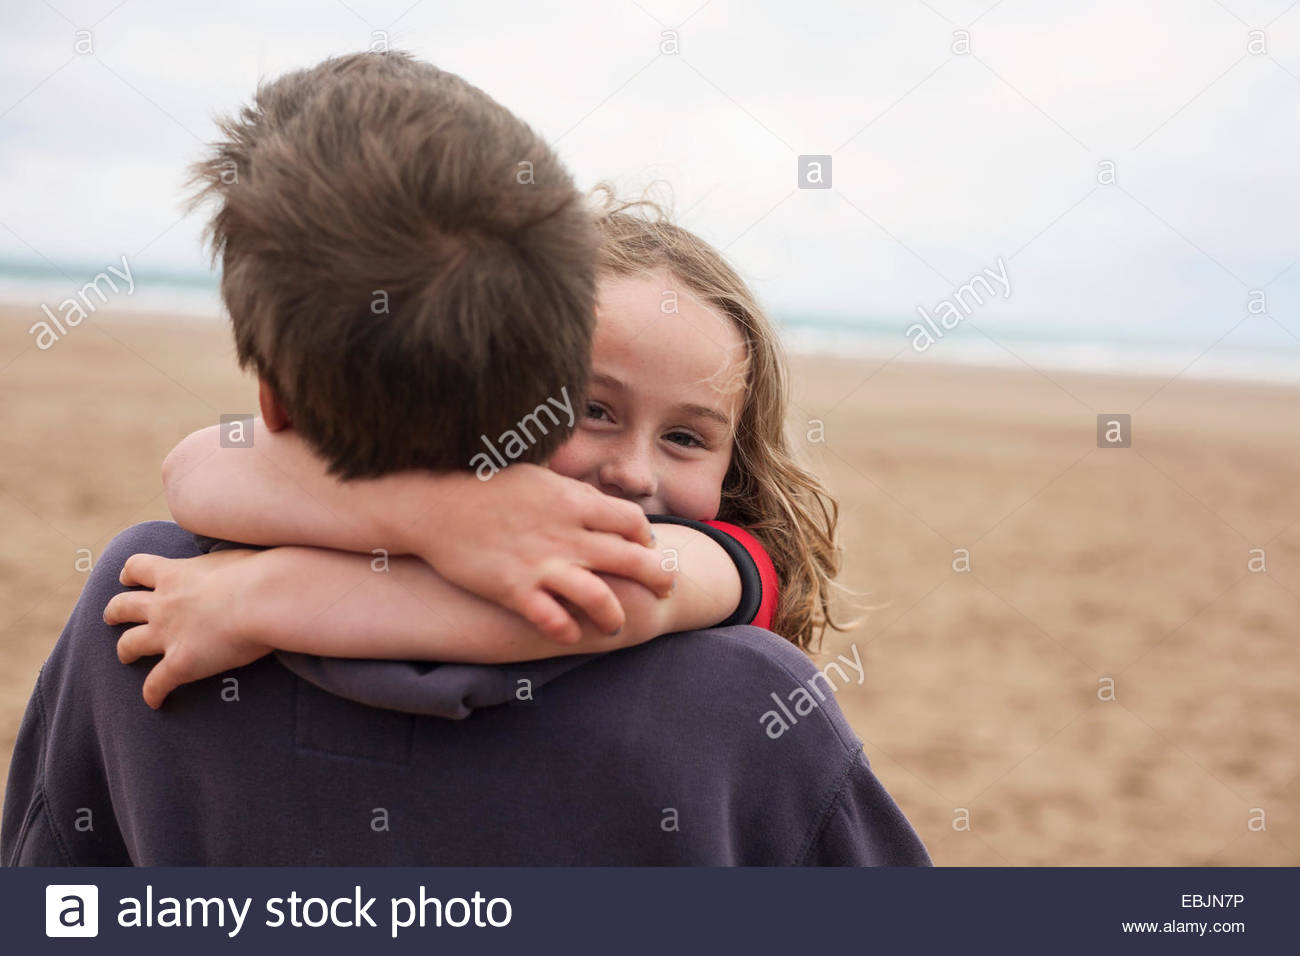 Abrazos boy en Playa Chica Imagen De Stock